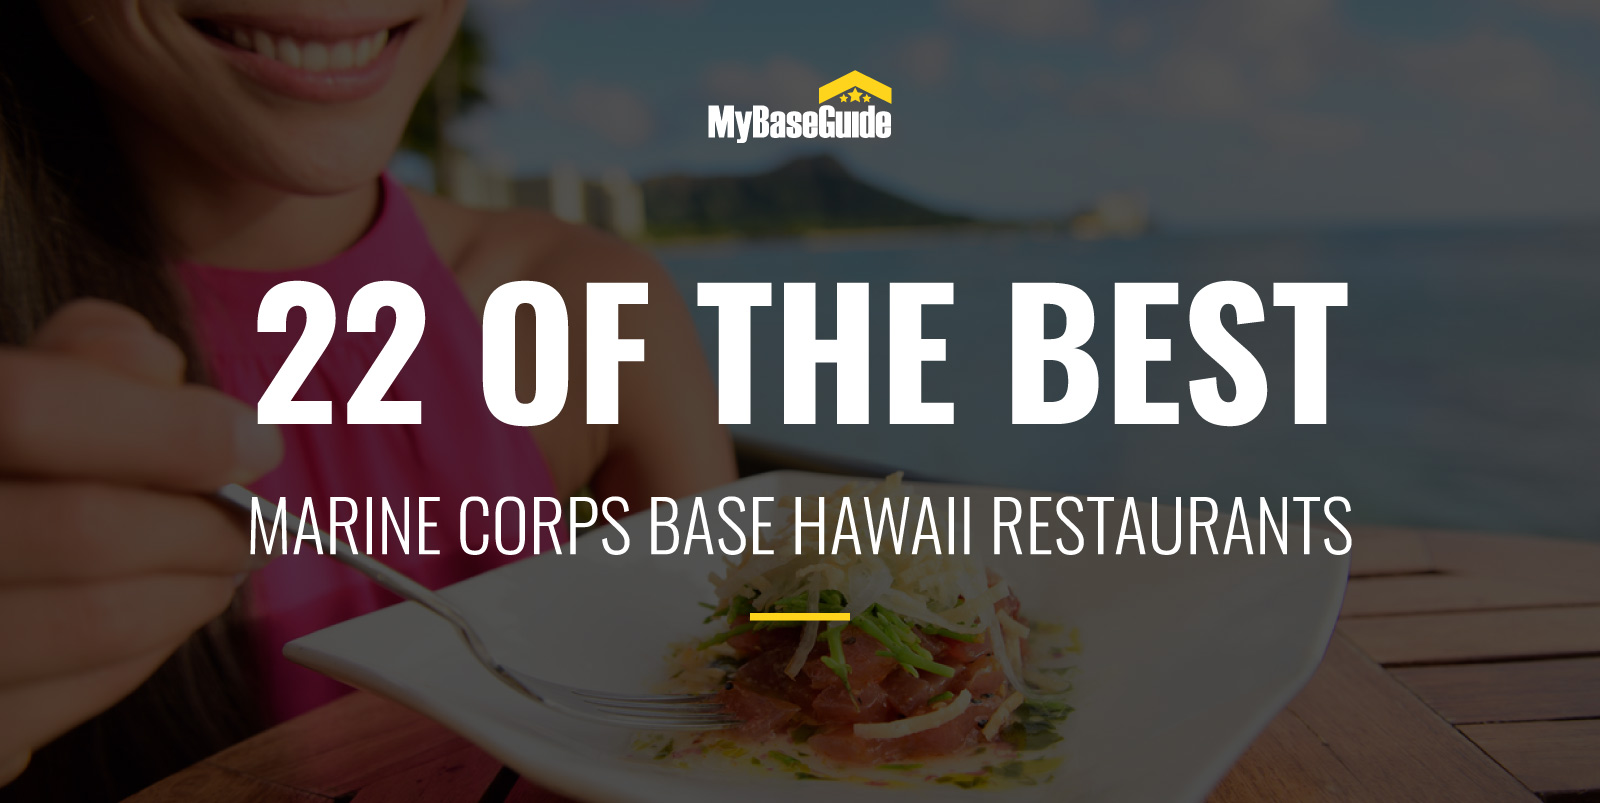 22 of the Best Marine Corps Base Hawaii (MCBH) Restaurants